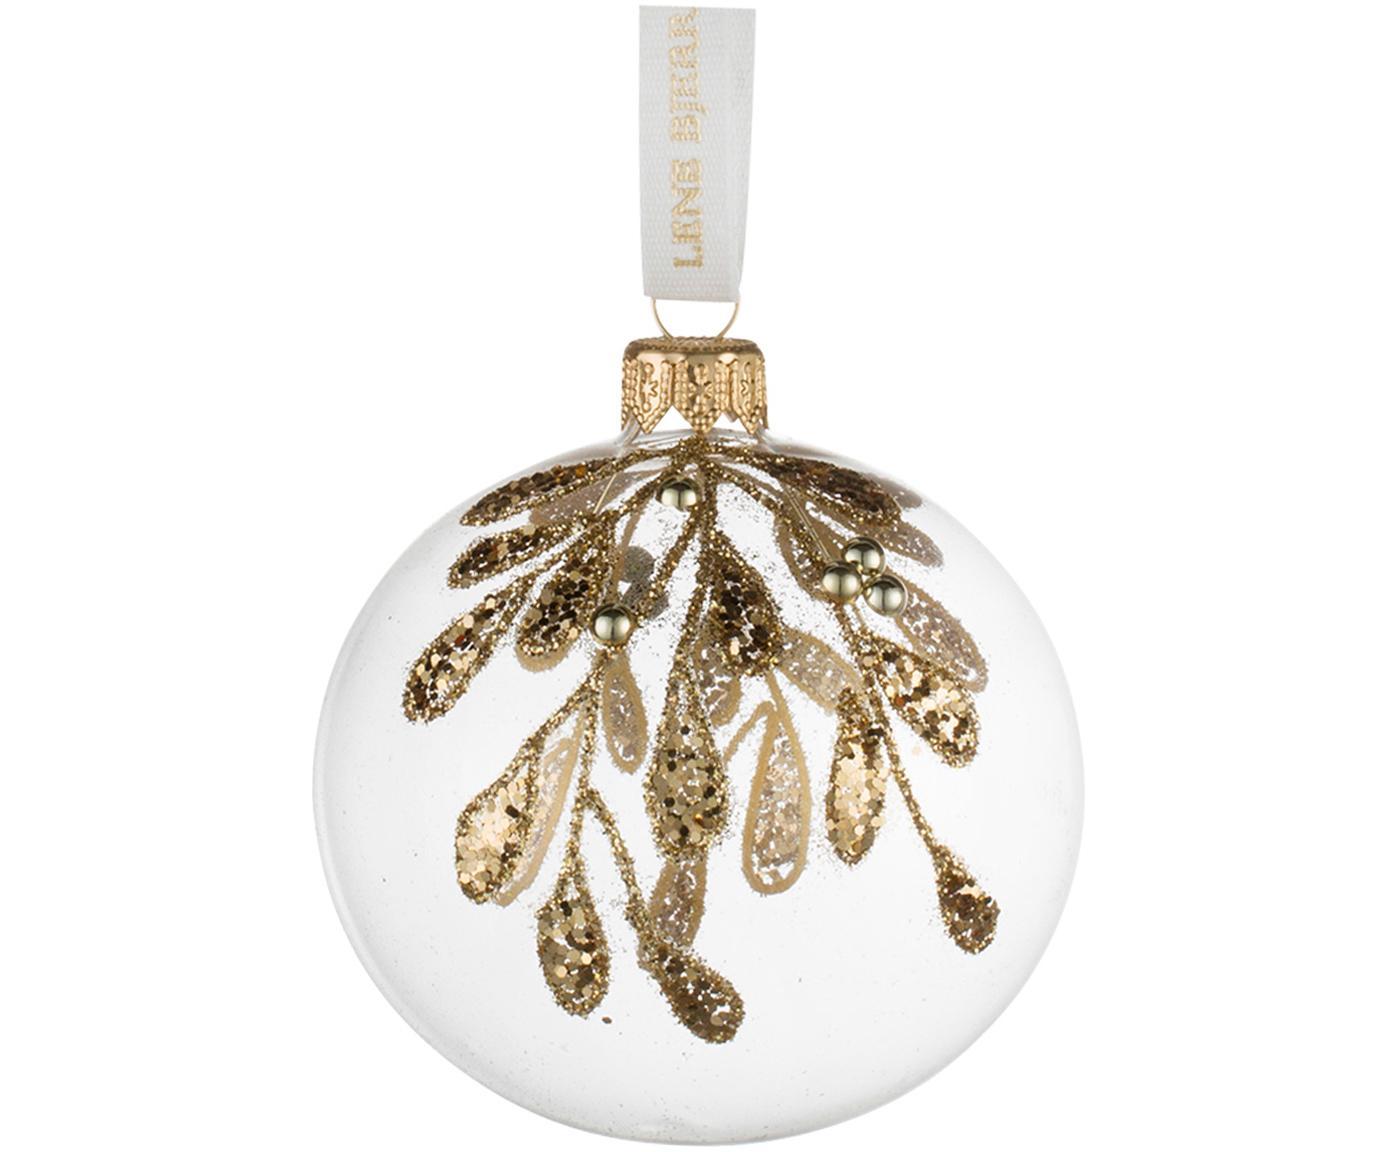 Kerstballen Cadelia, 2 stuks, Ophanglus: polyester, Transparant, goudkleurig, Ø 8 cm